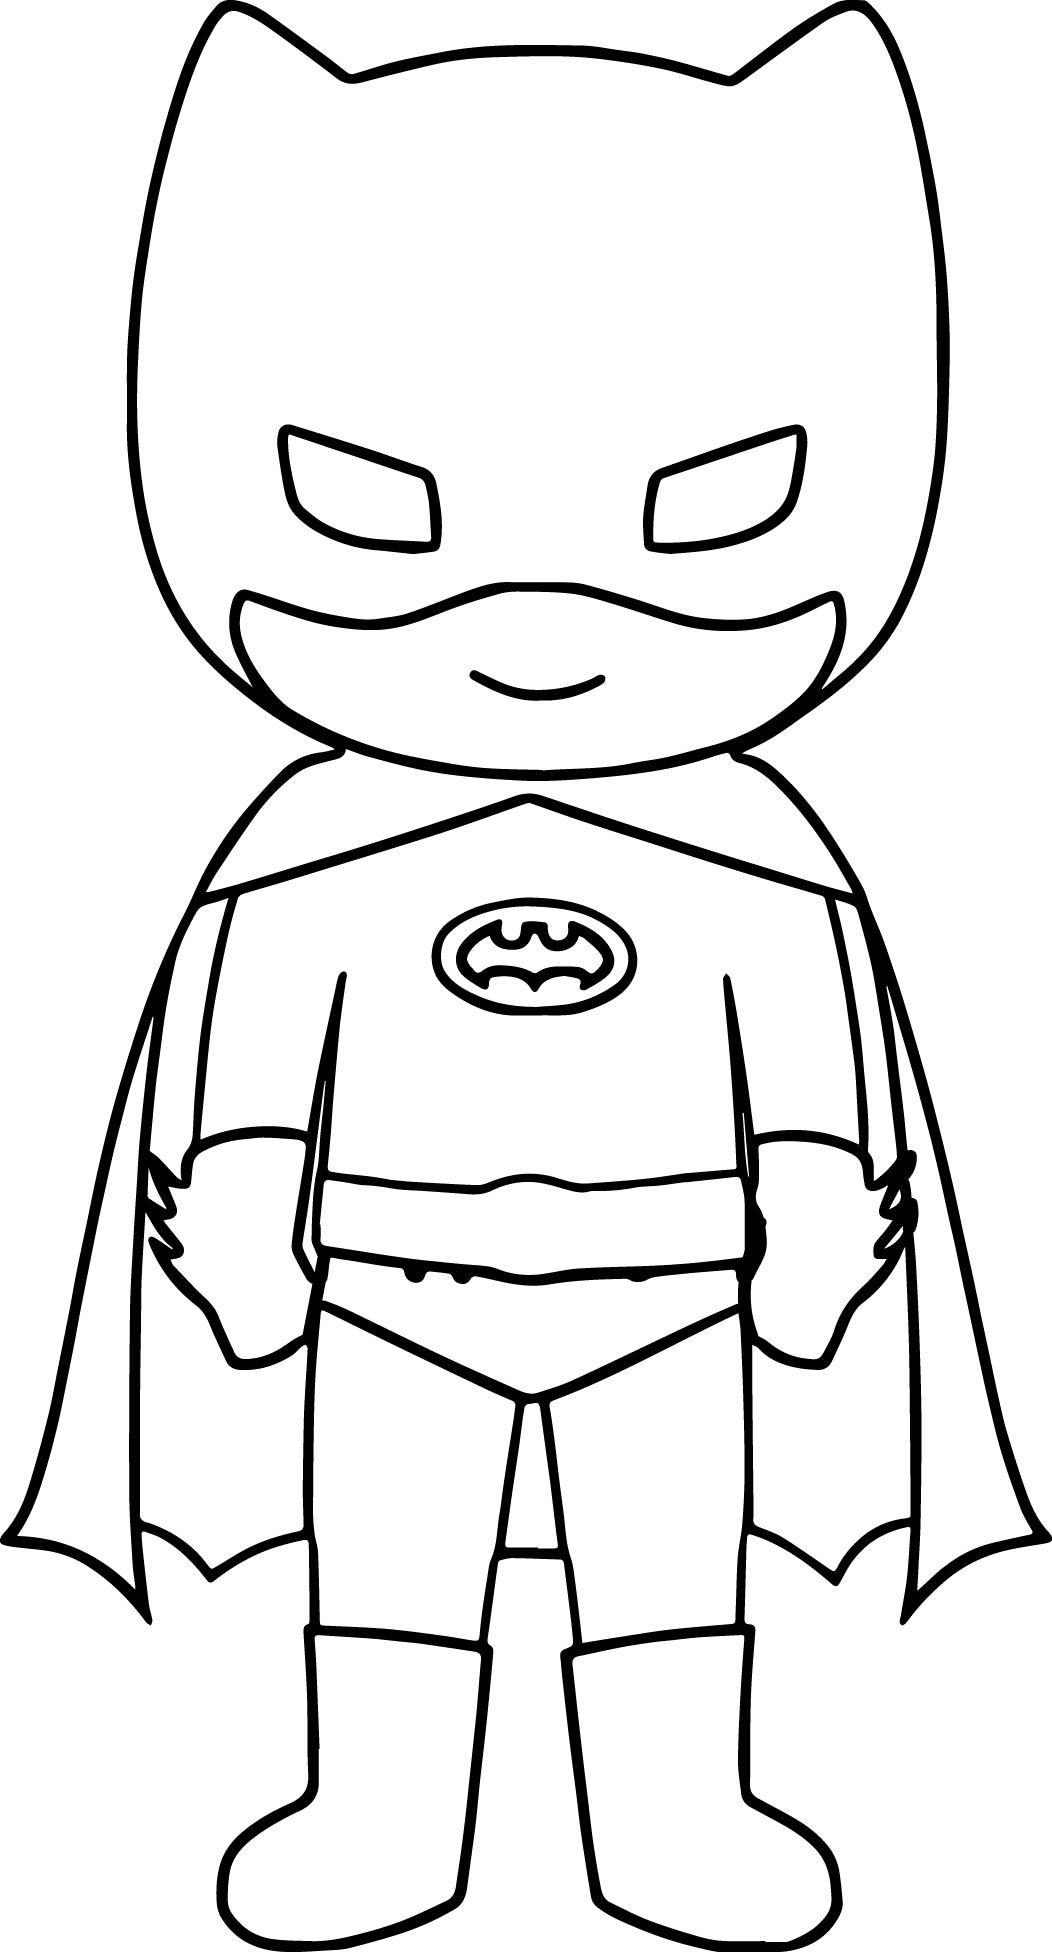 Cool Bat Superhero Kids Coloring Page